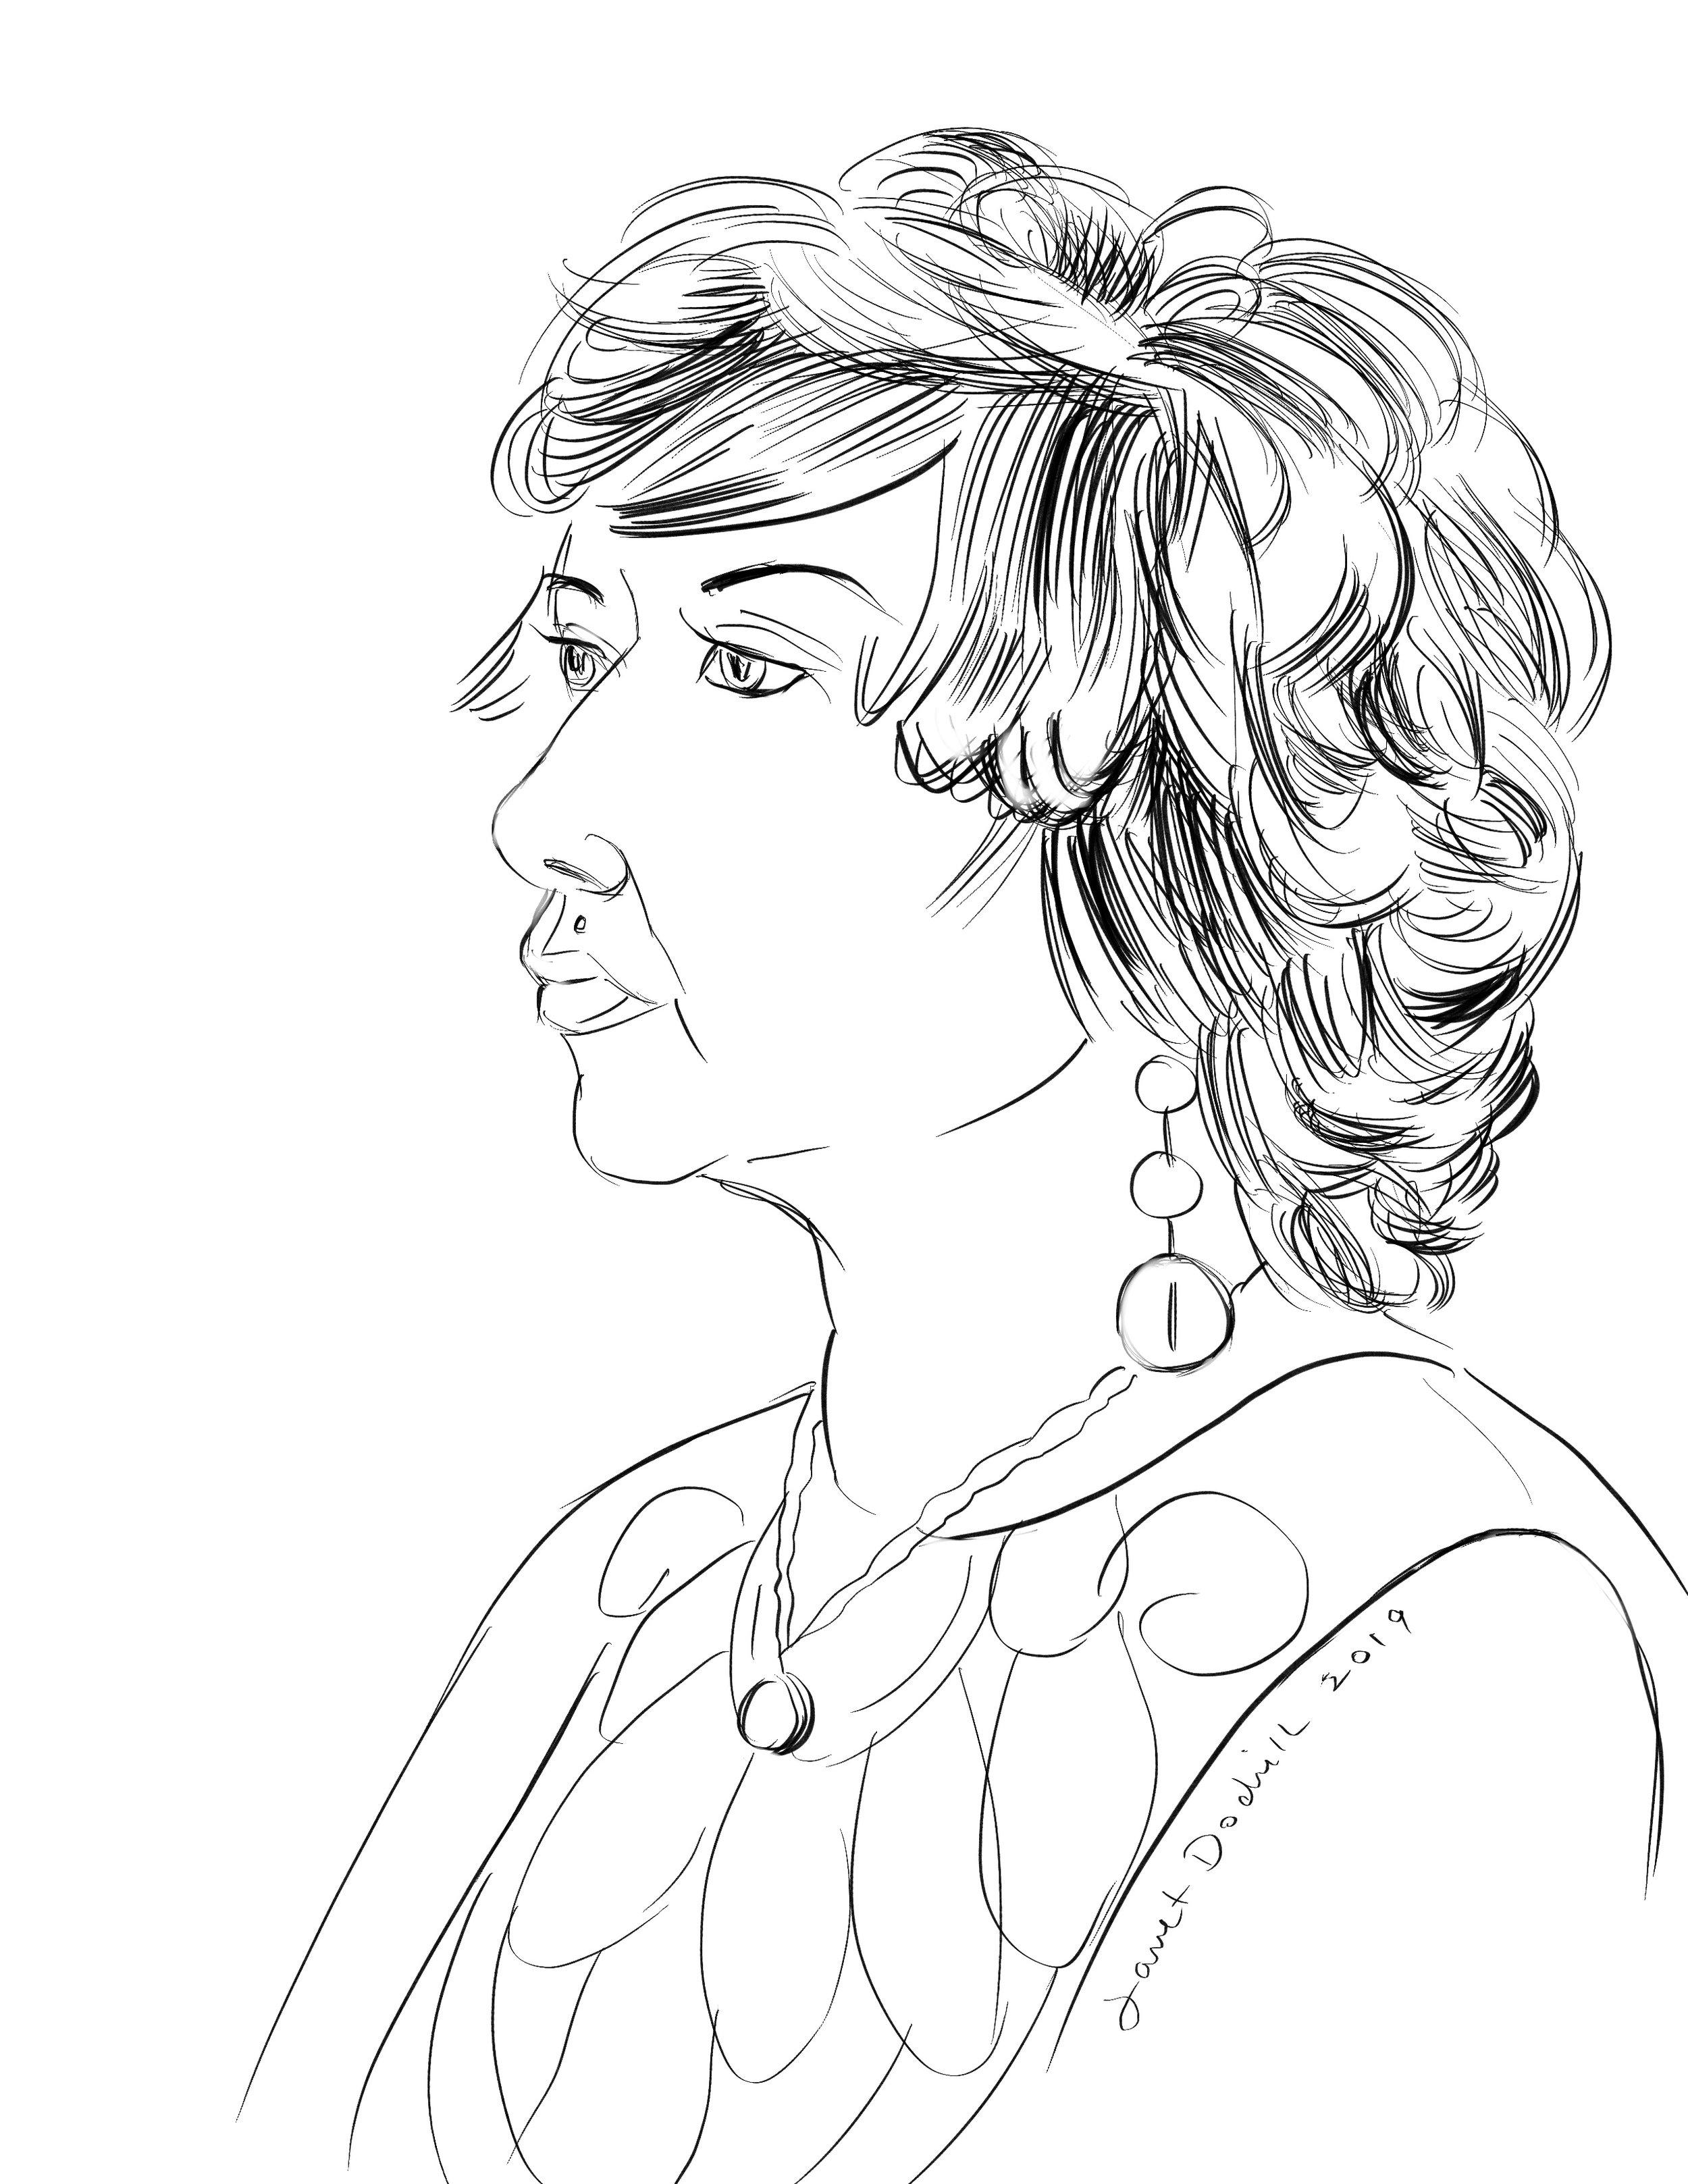 Janet Dodrill - I Pad